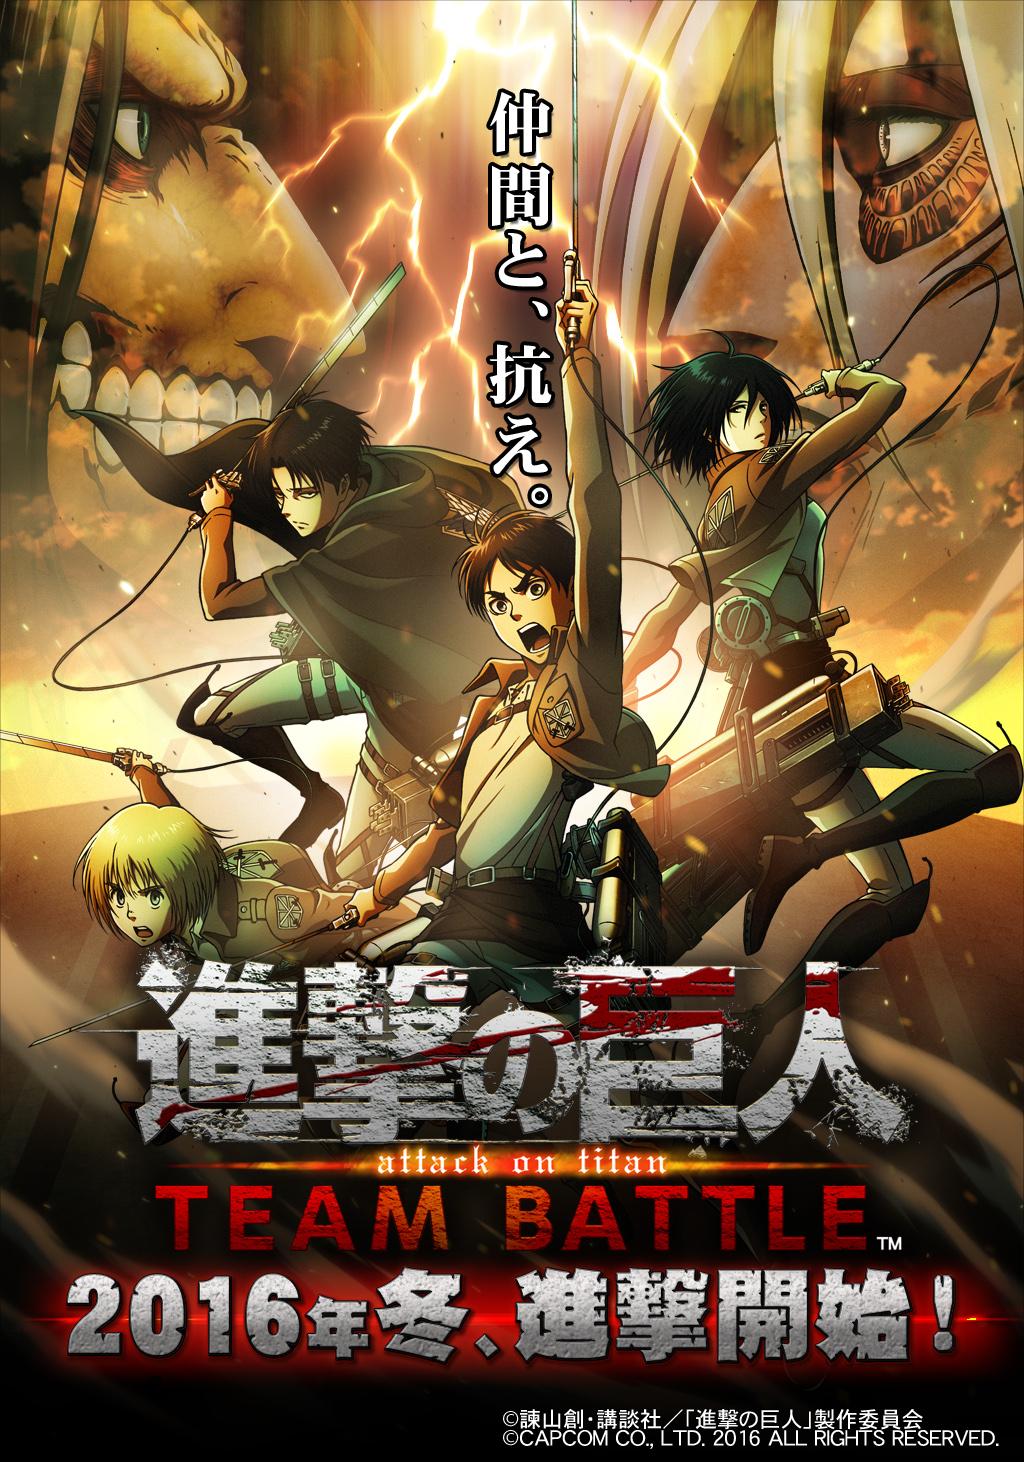 Capcom to Debut Attack on Titan Team Battle at Japan Amusement Expo 2016